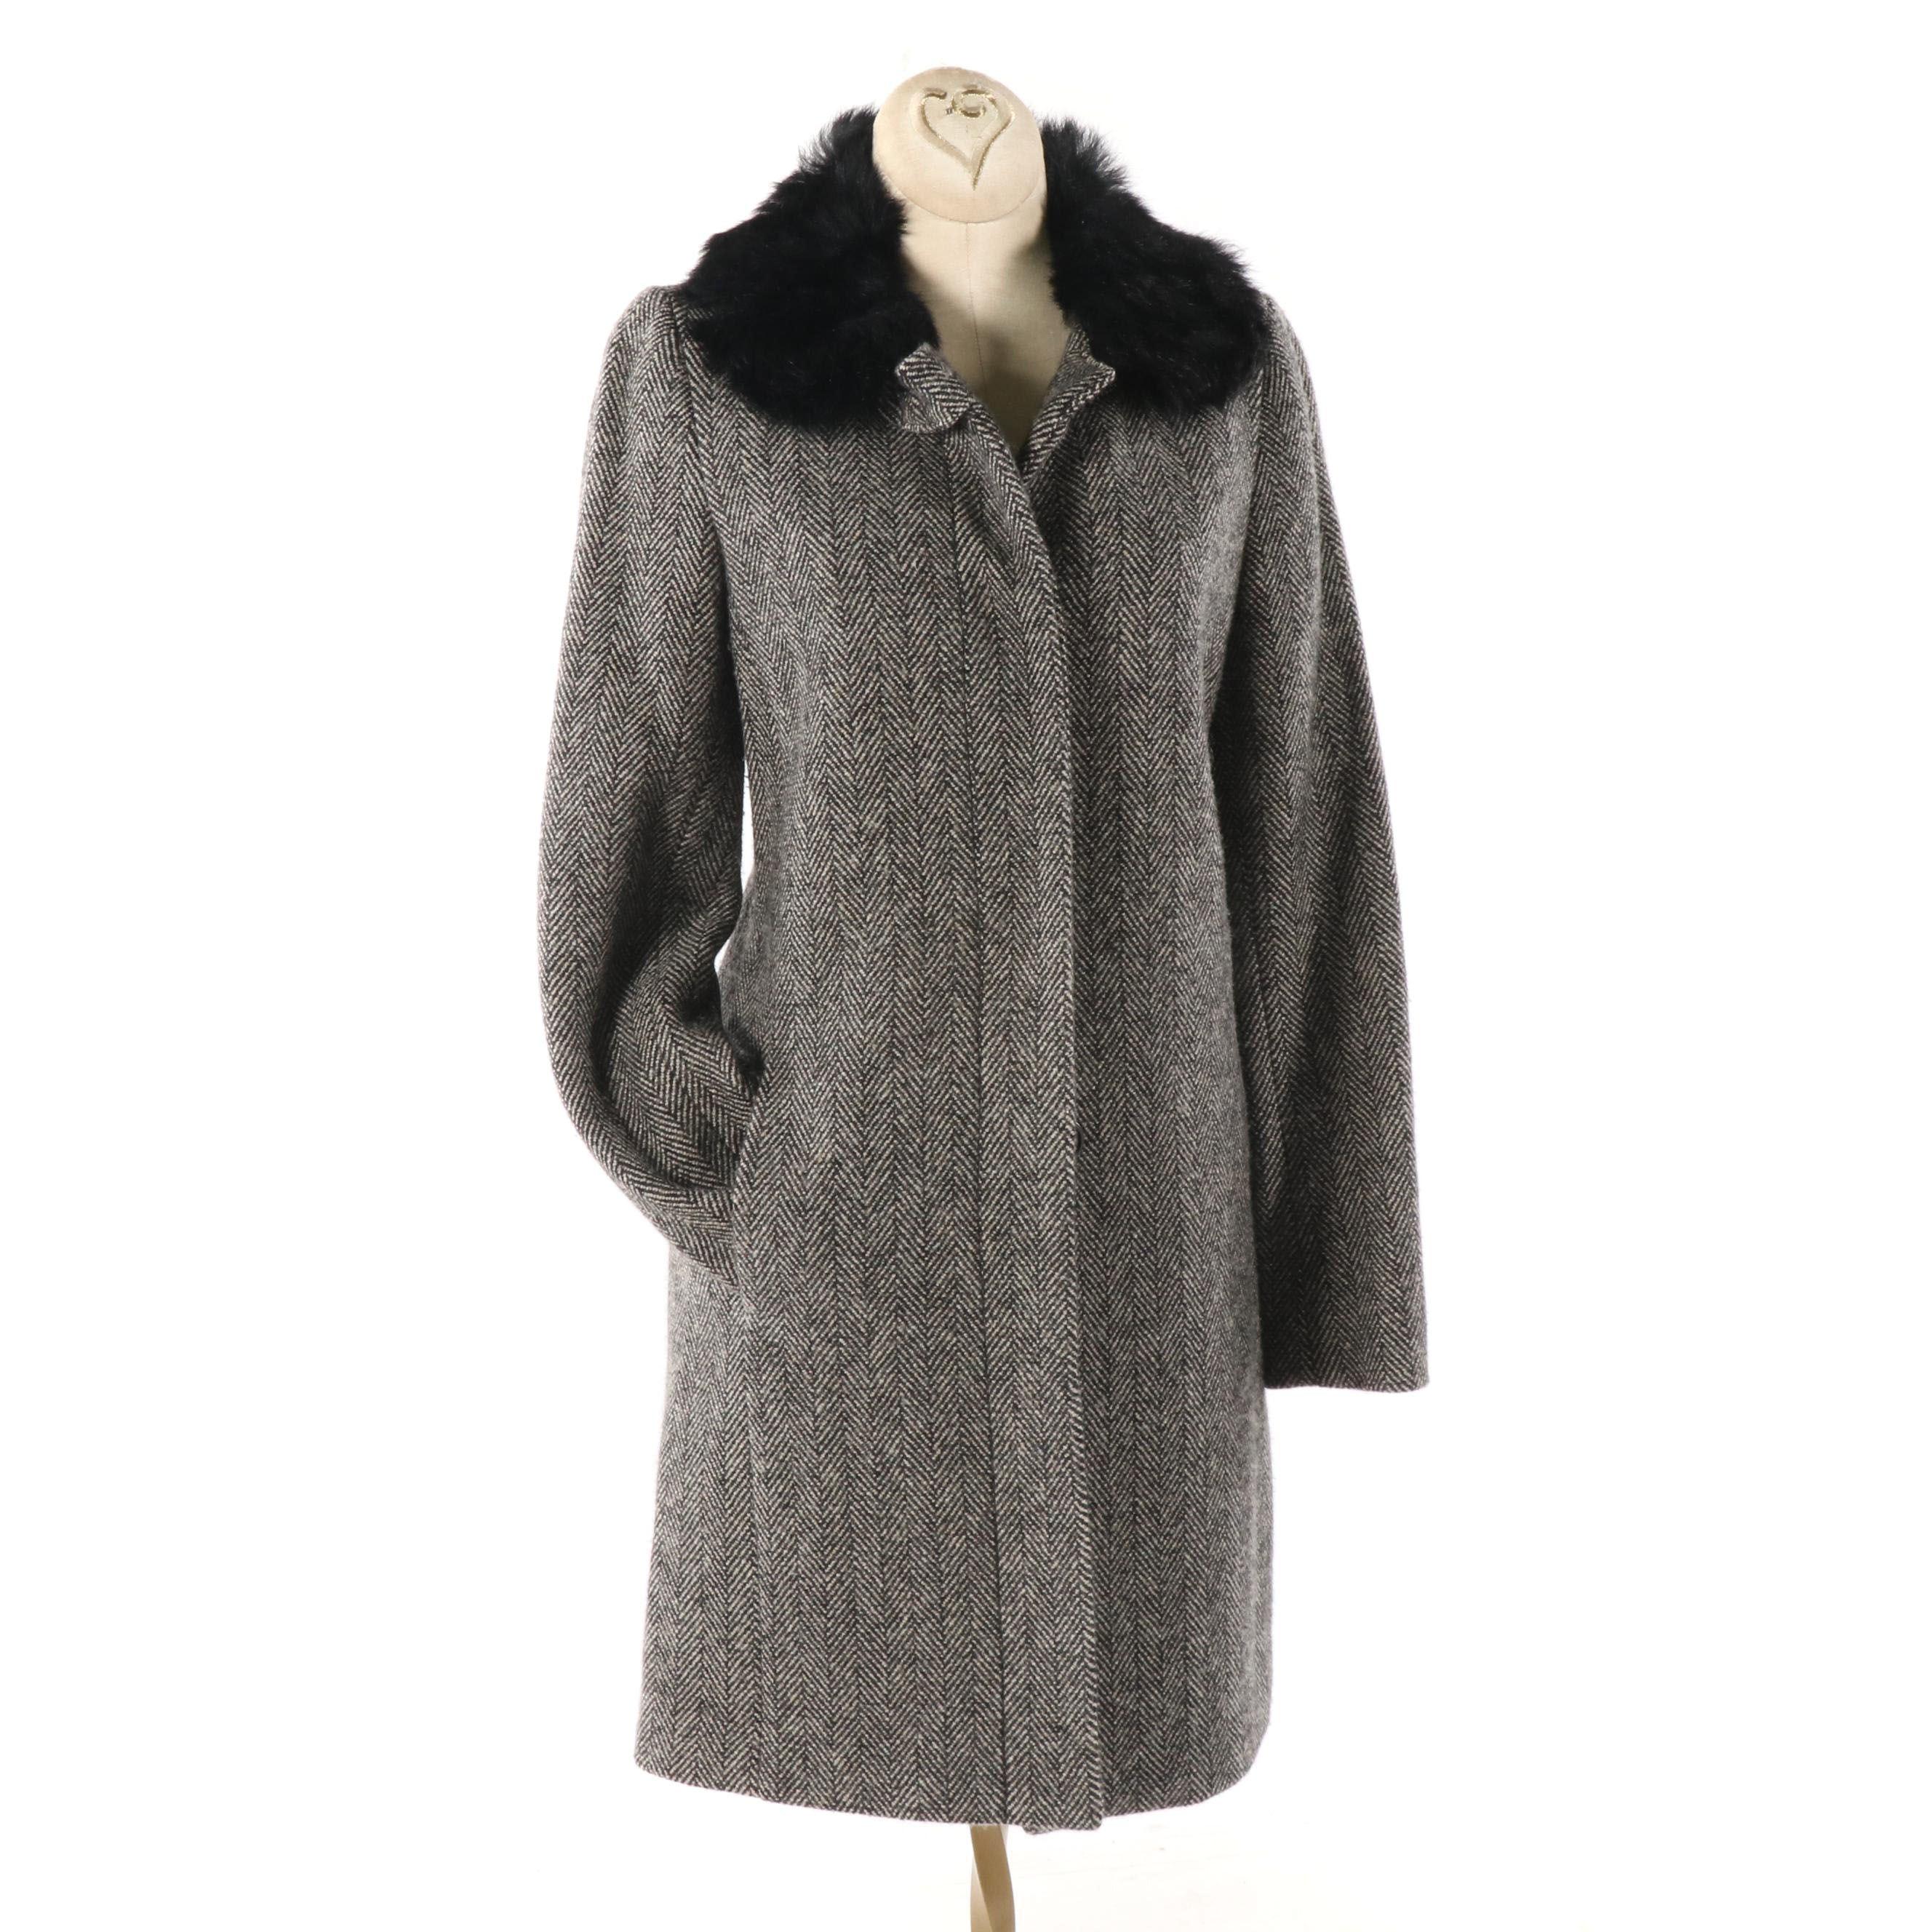 Women's Banana Republic Herringbone Wool Coat with Shearling Collar